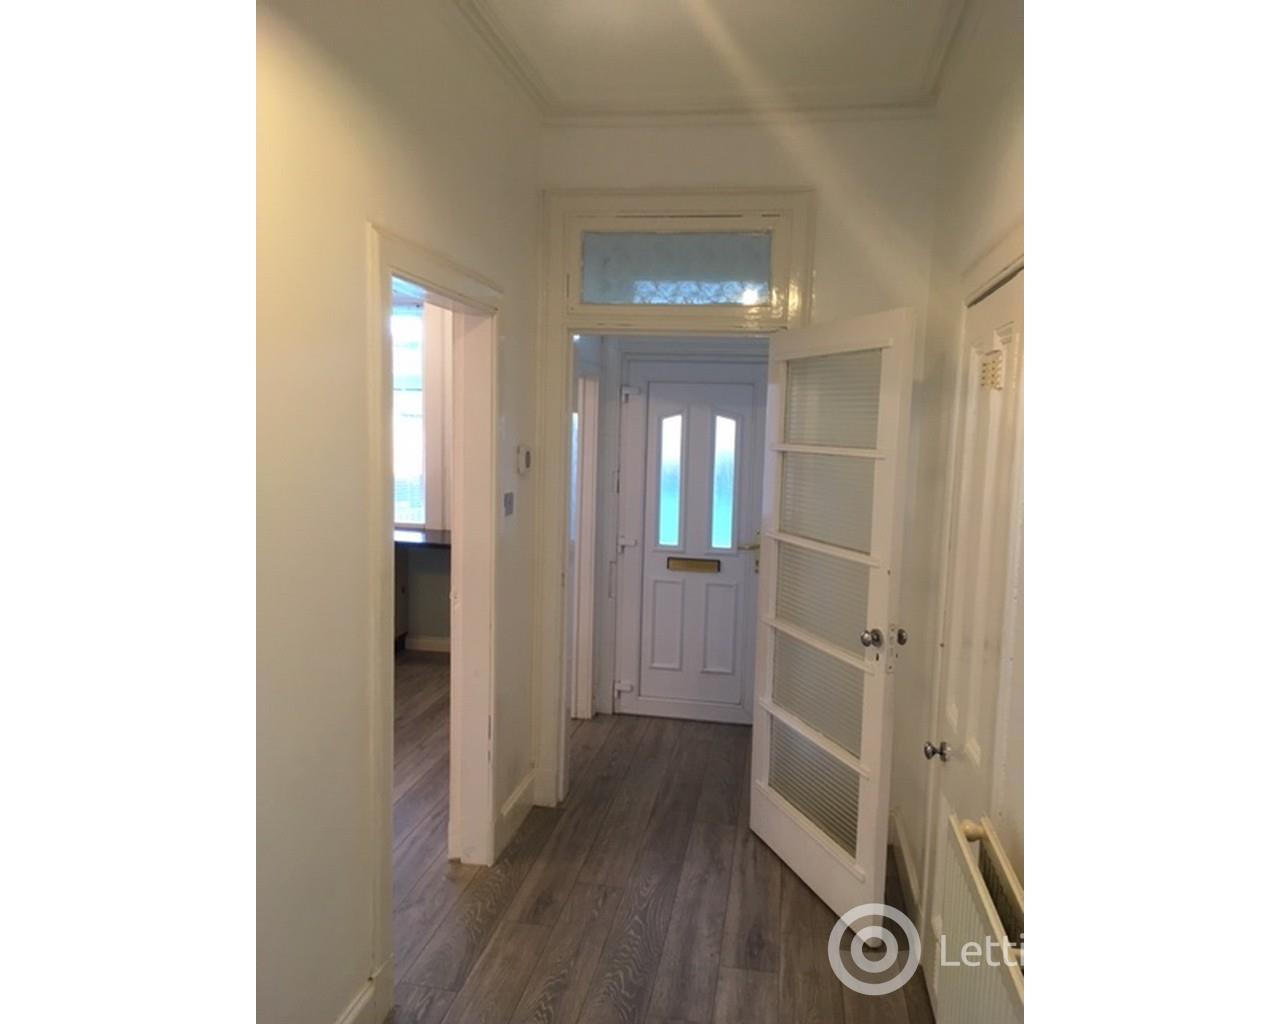 Property to rent in Finlaystone Street, Blairhill, Coatbridge, ML5